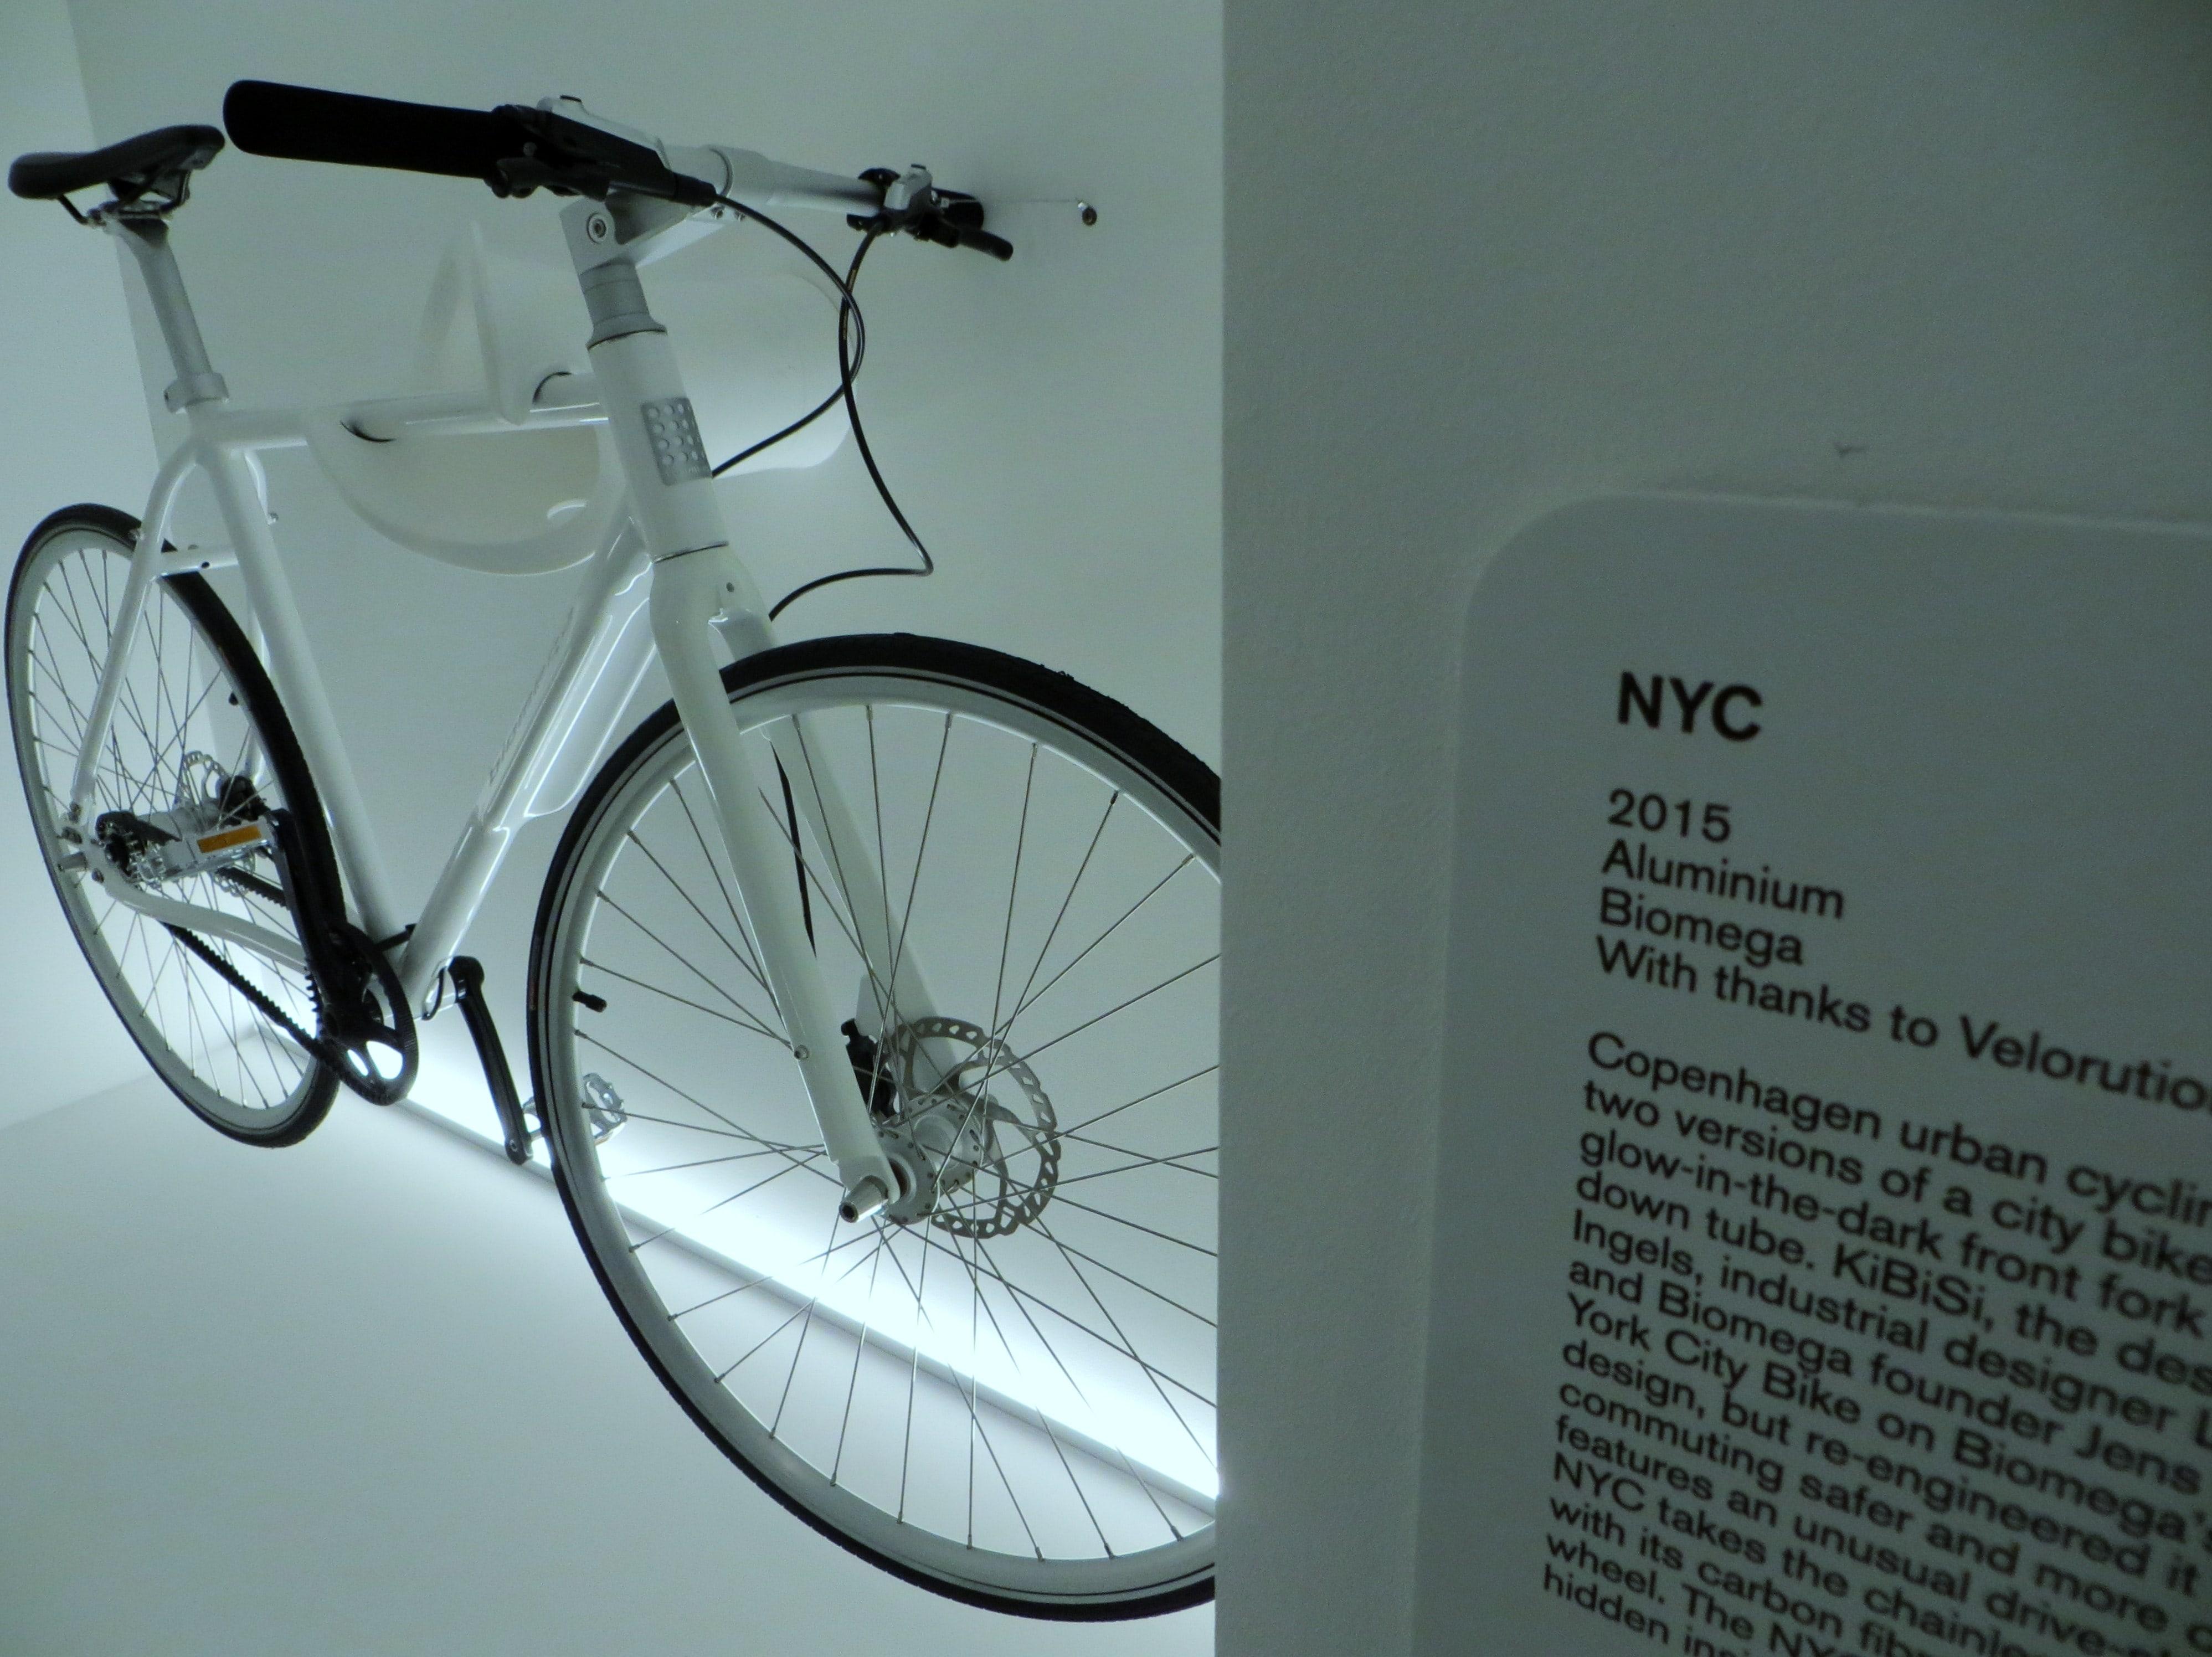 Cycle-Revolution-Biomega-NYC-min-2